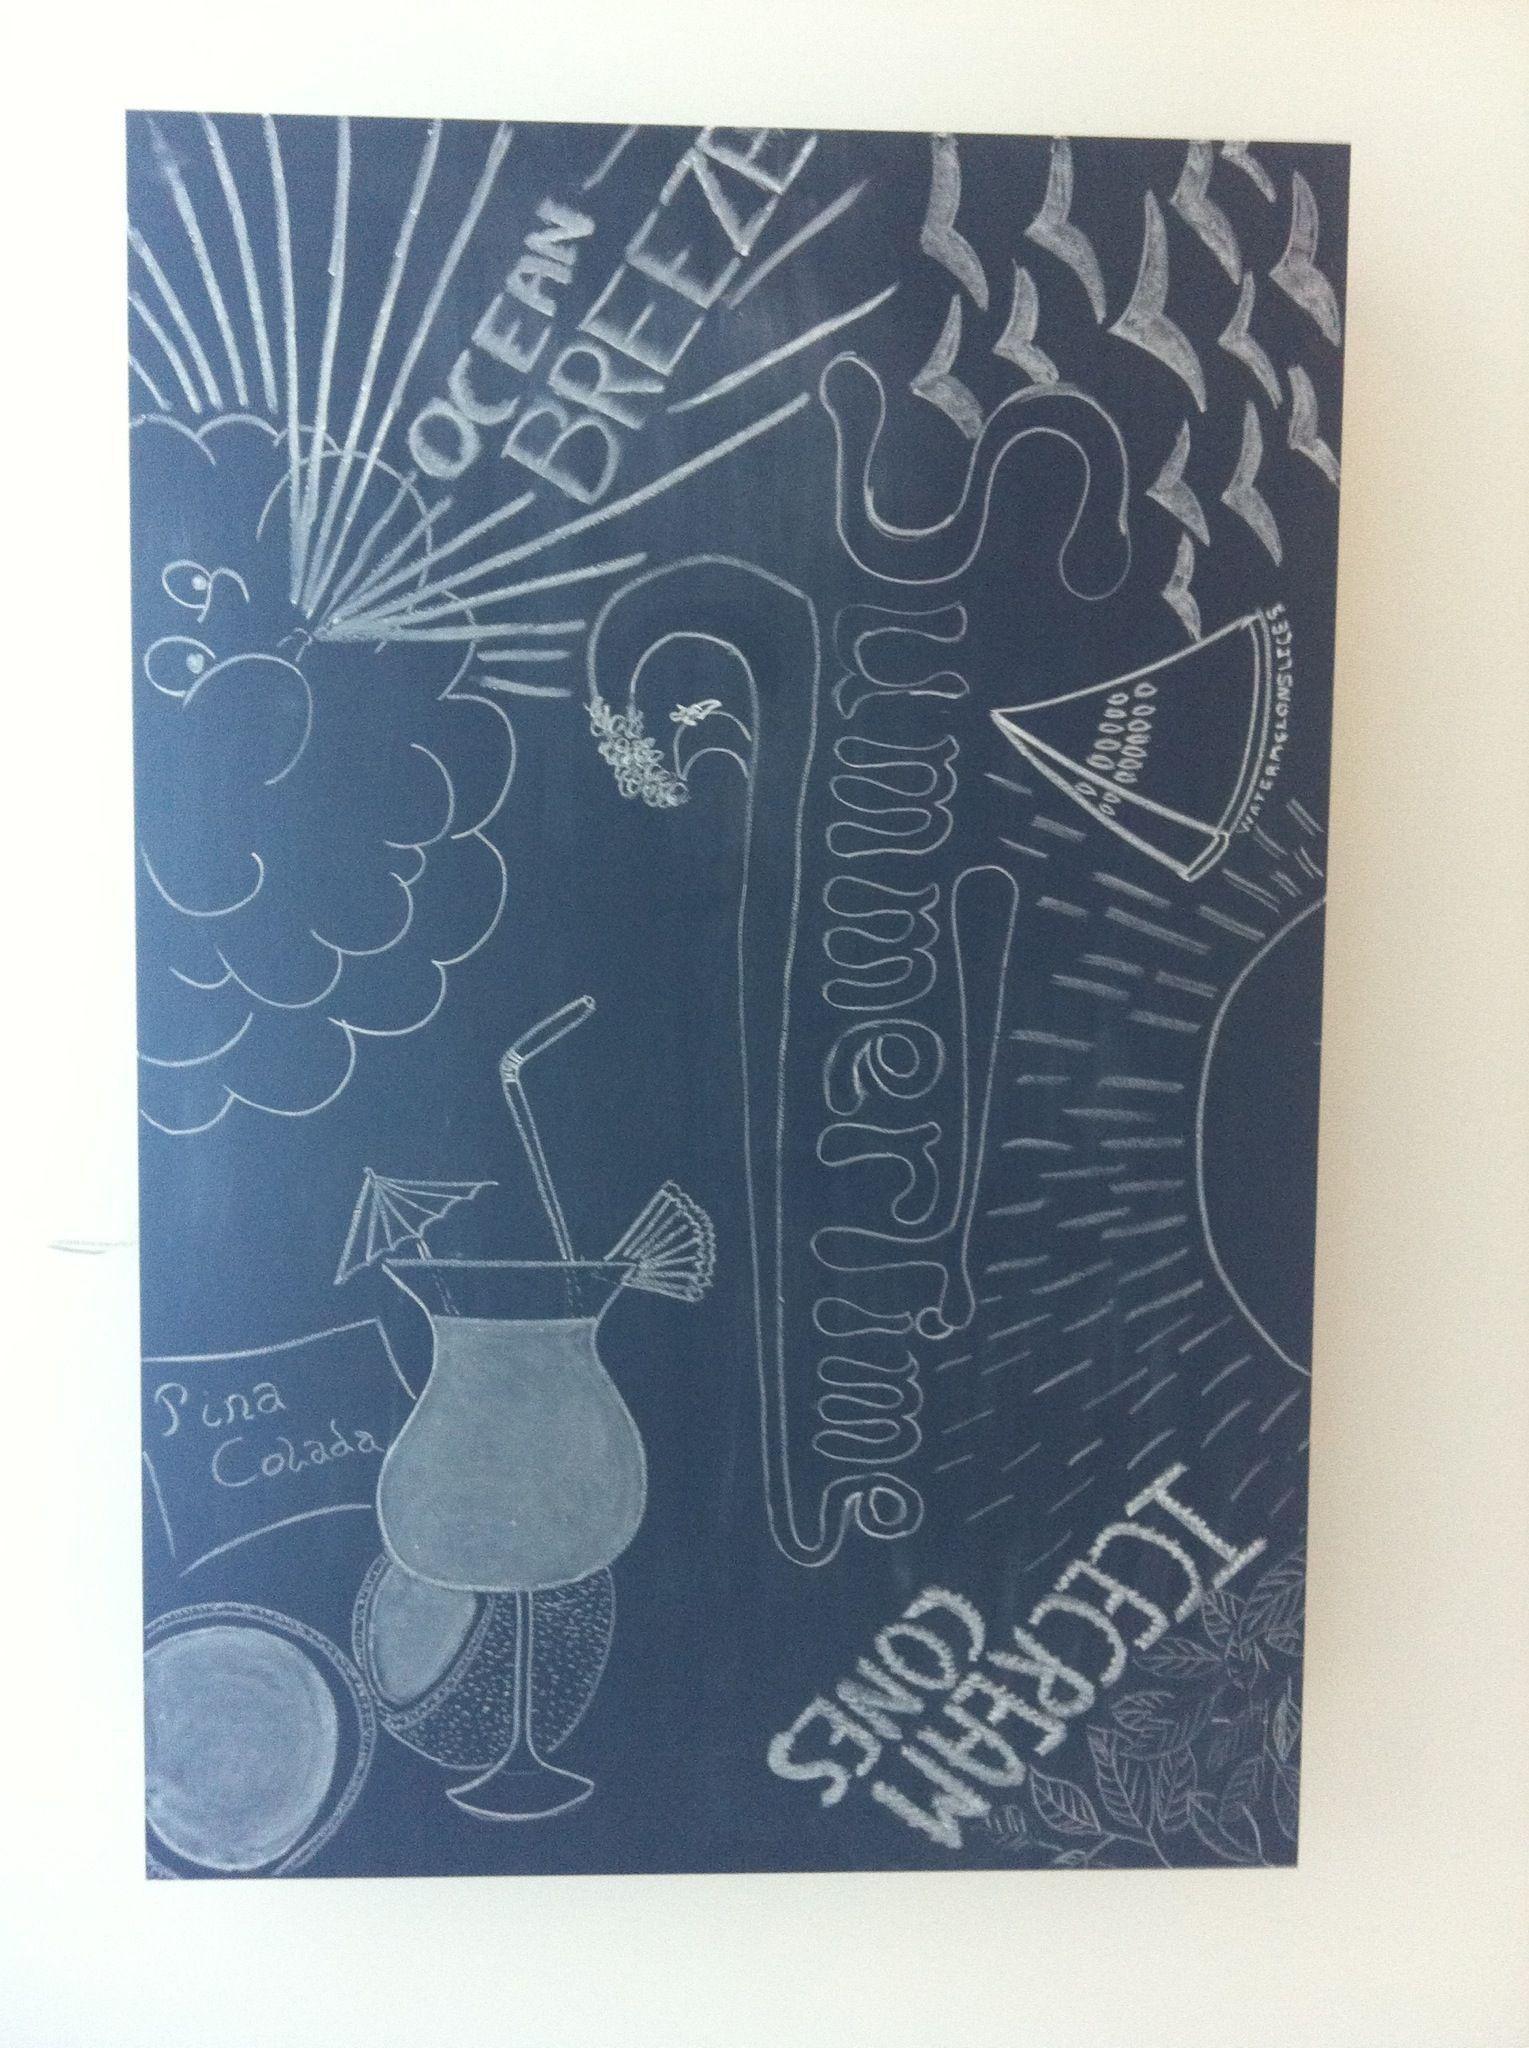 Summertime ceiling chalkboard